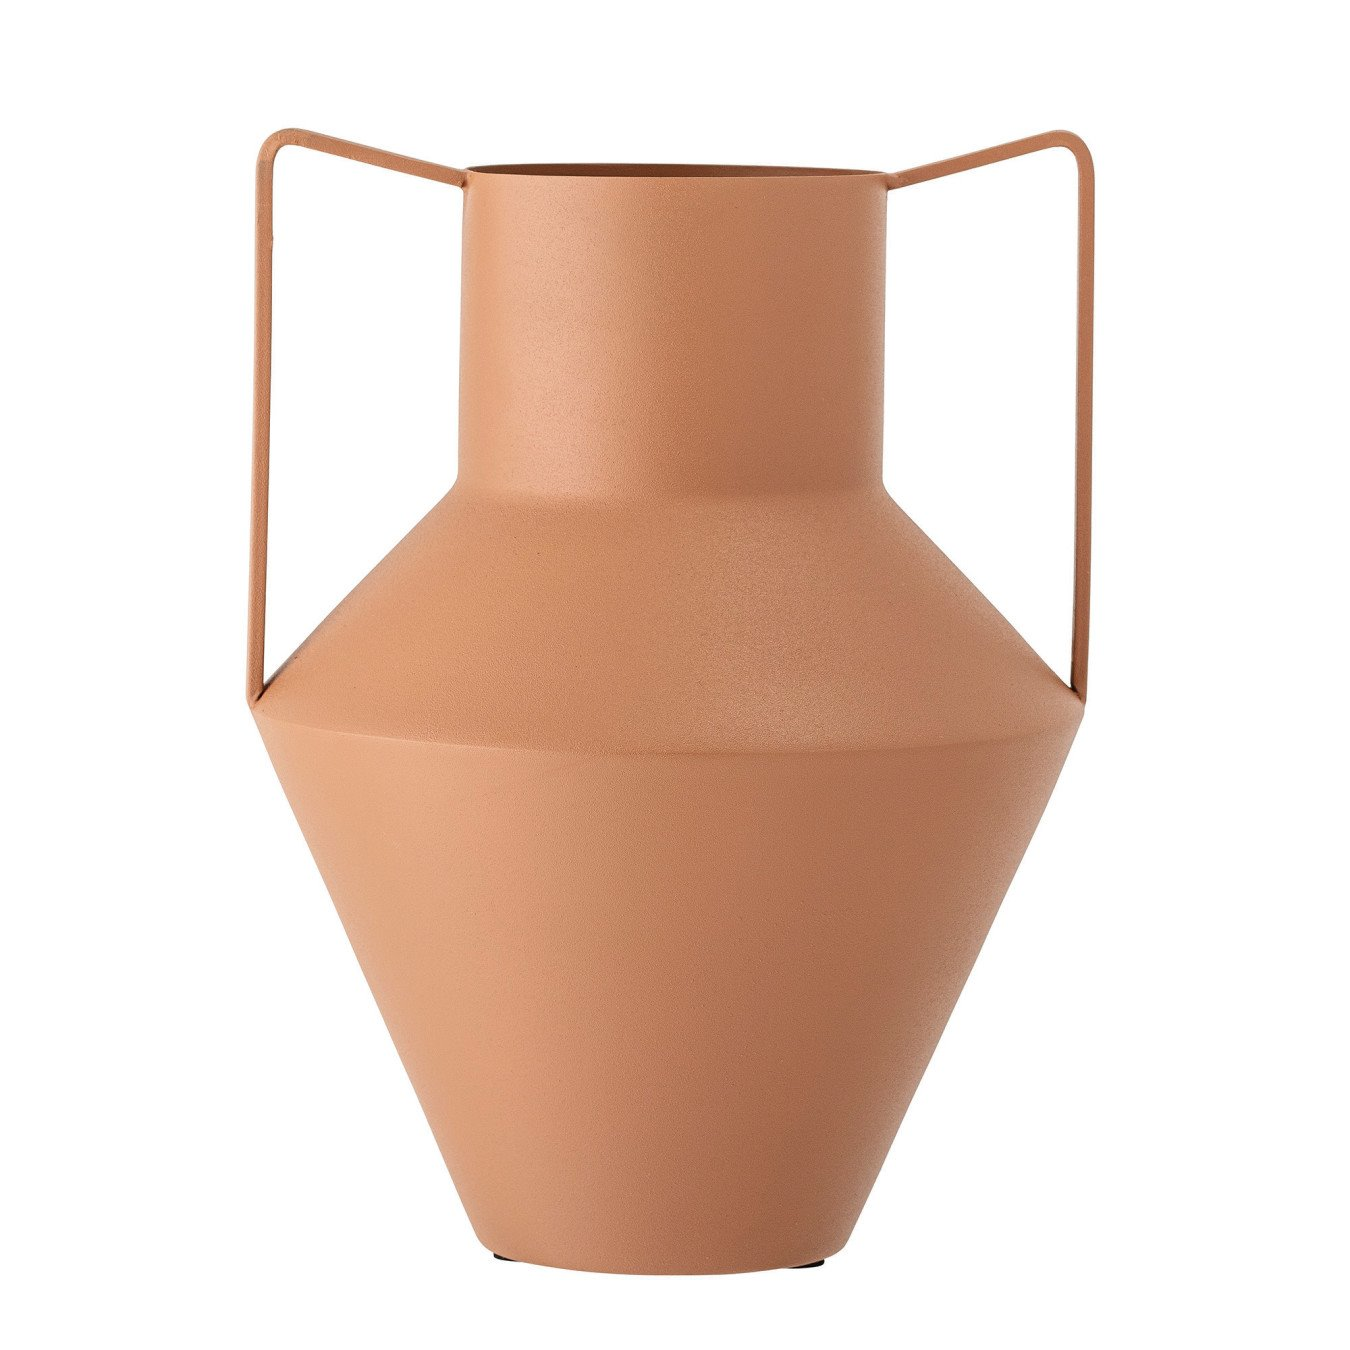 Matte Rust Finish Textured Metal Vase w/ Handles